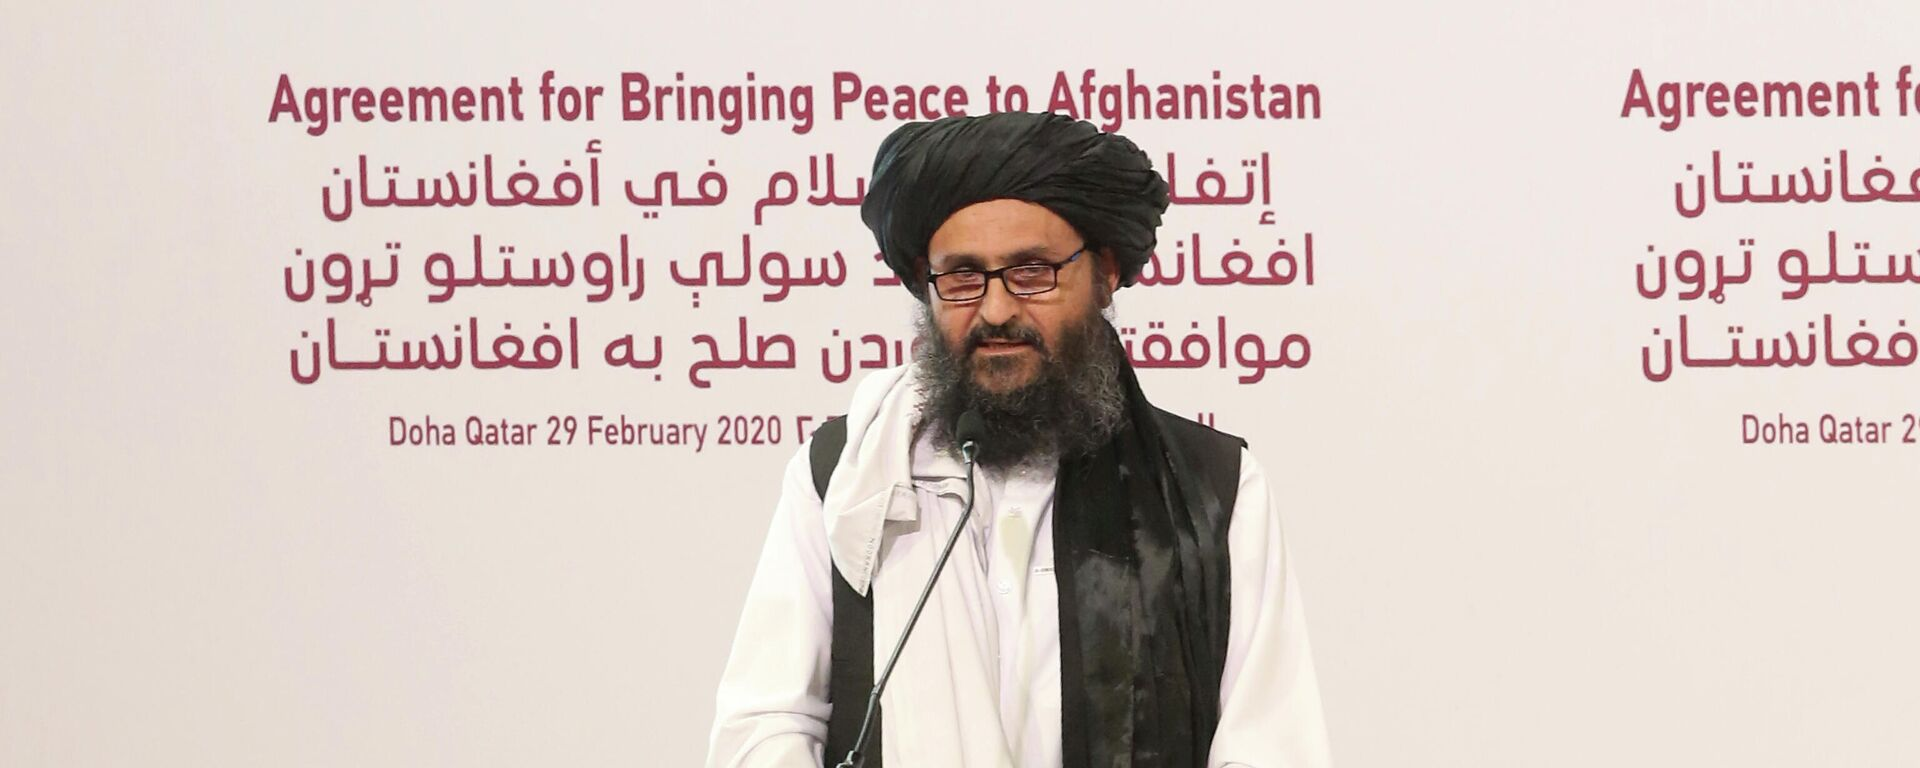 Мулла Абдул Гани Барадар, главный политический лидер группы Талибан - Sputnik Таджикистан, 1920, 13.09.2021